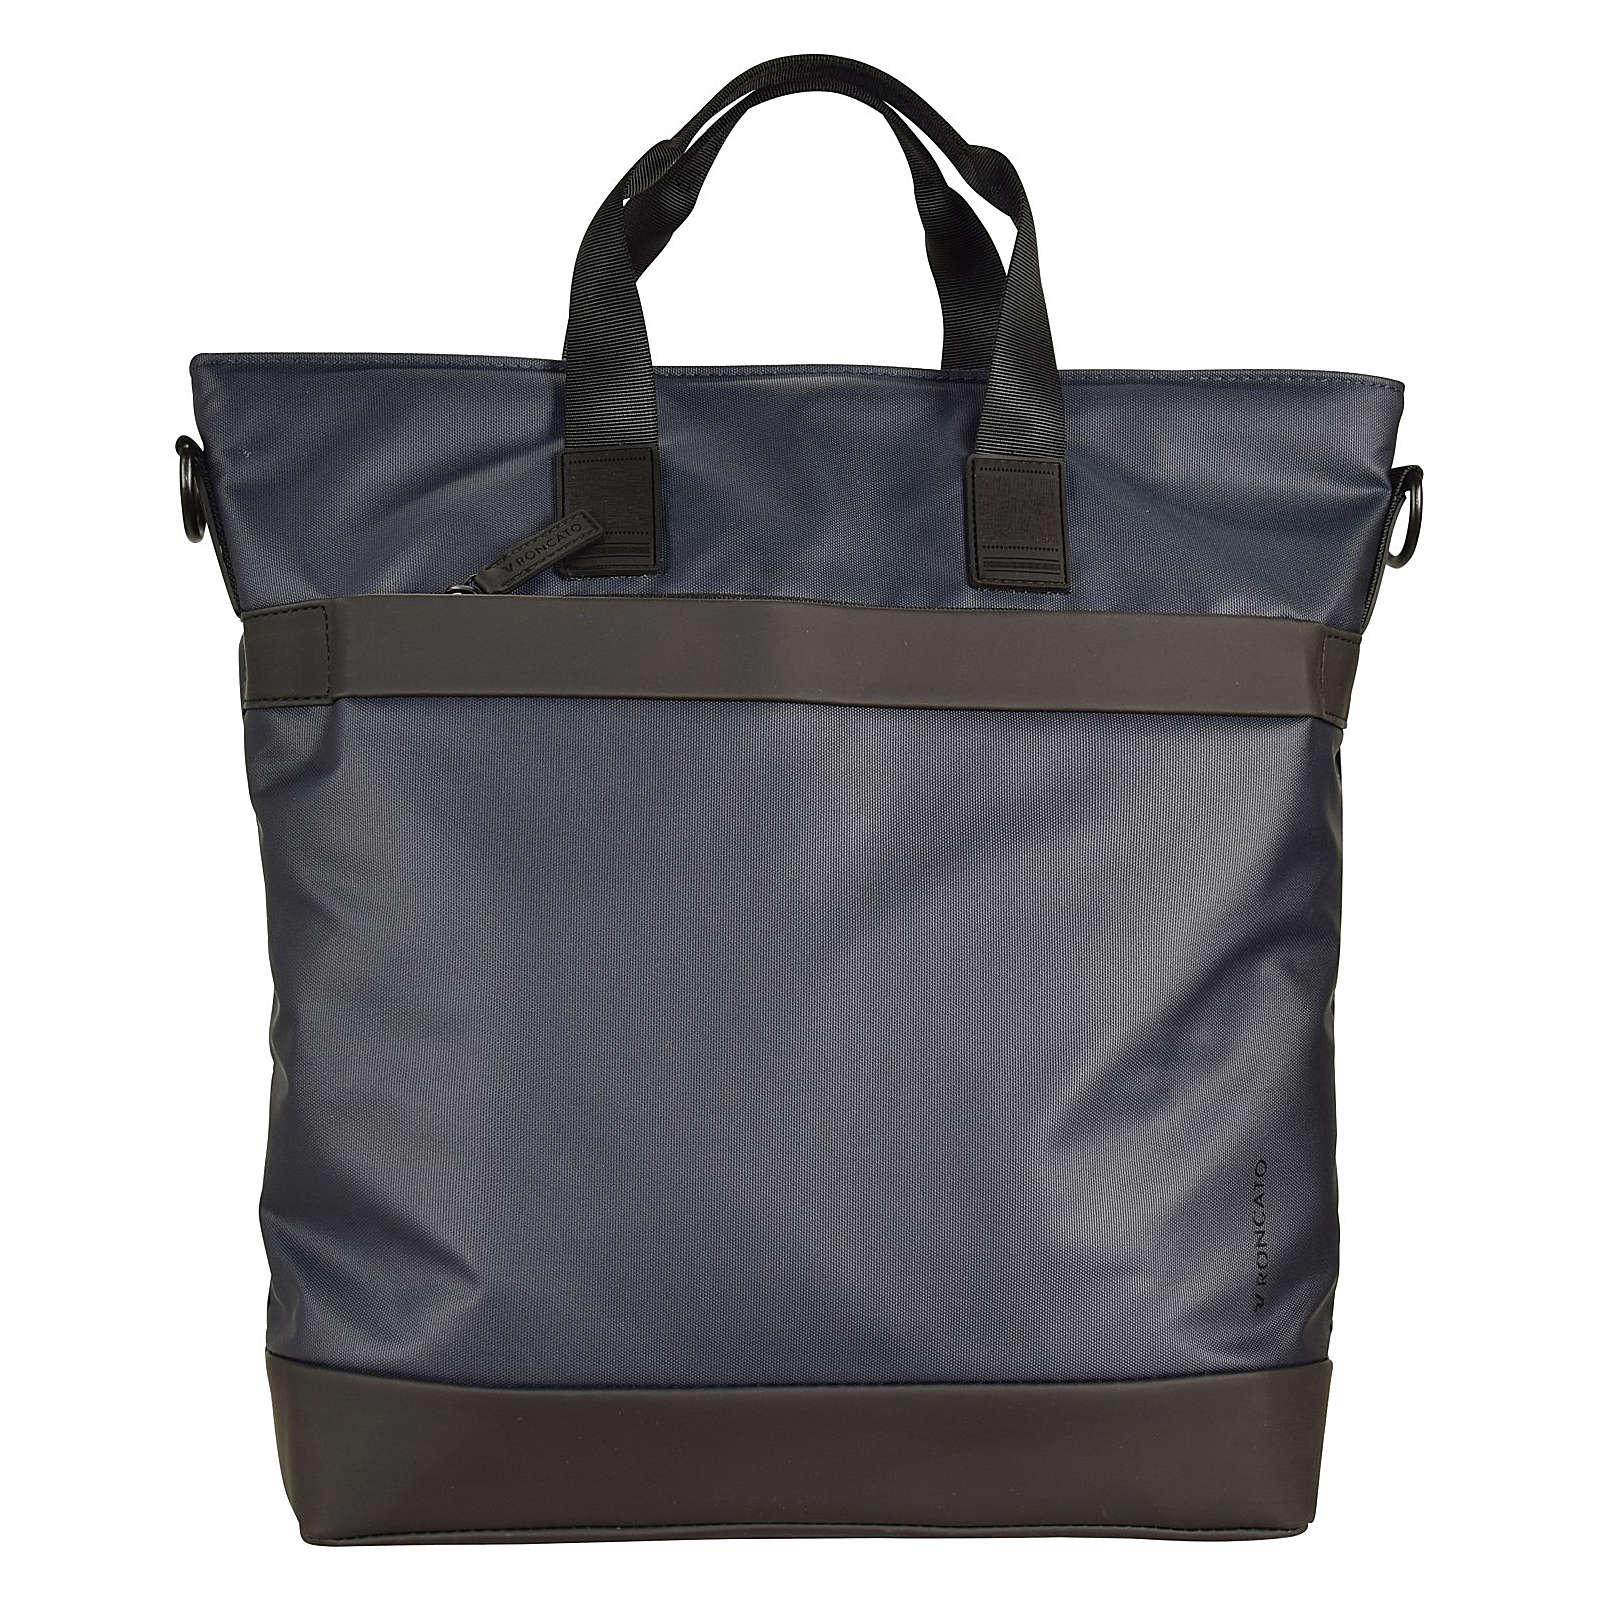 Roncato Oxford Shopper Tasche 34 cm Laptopfach ...